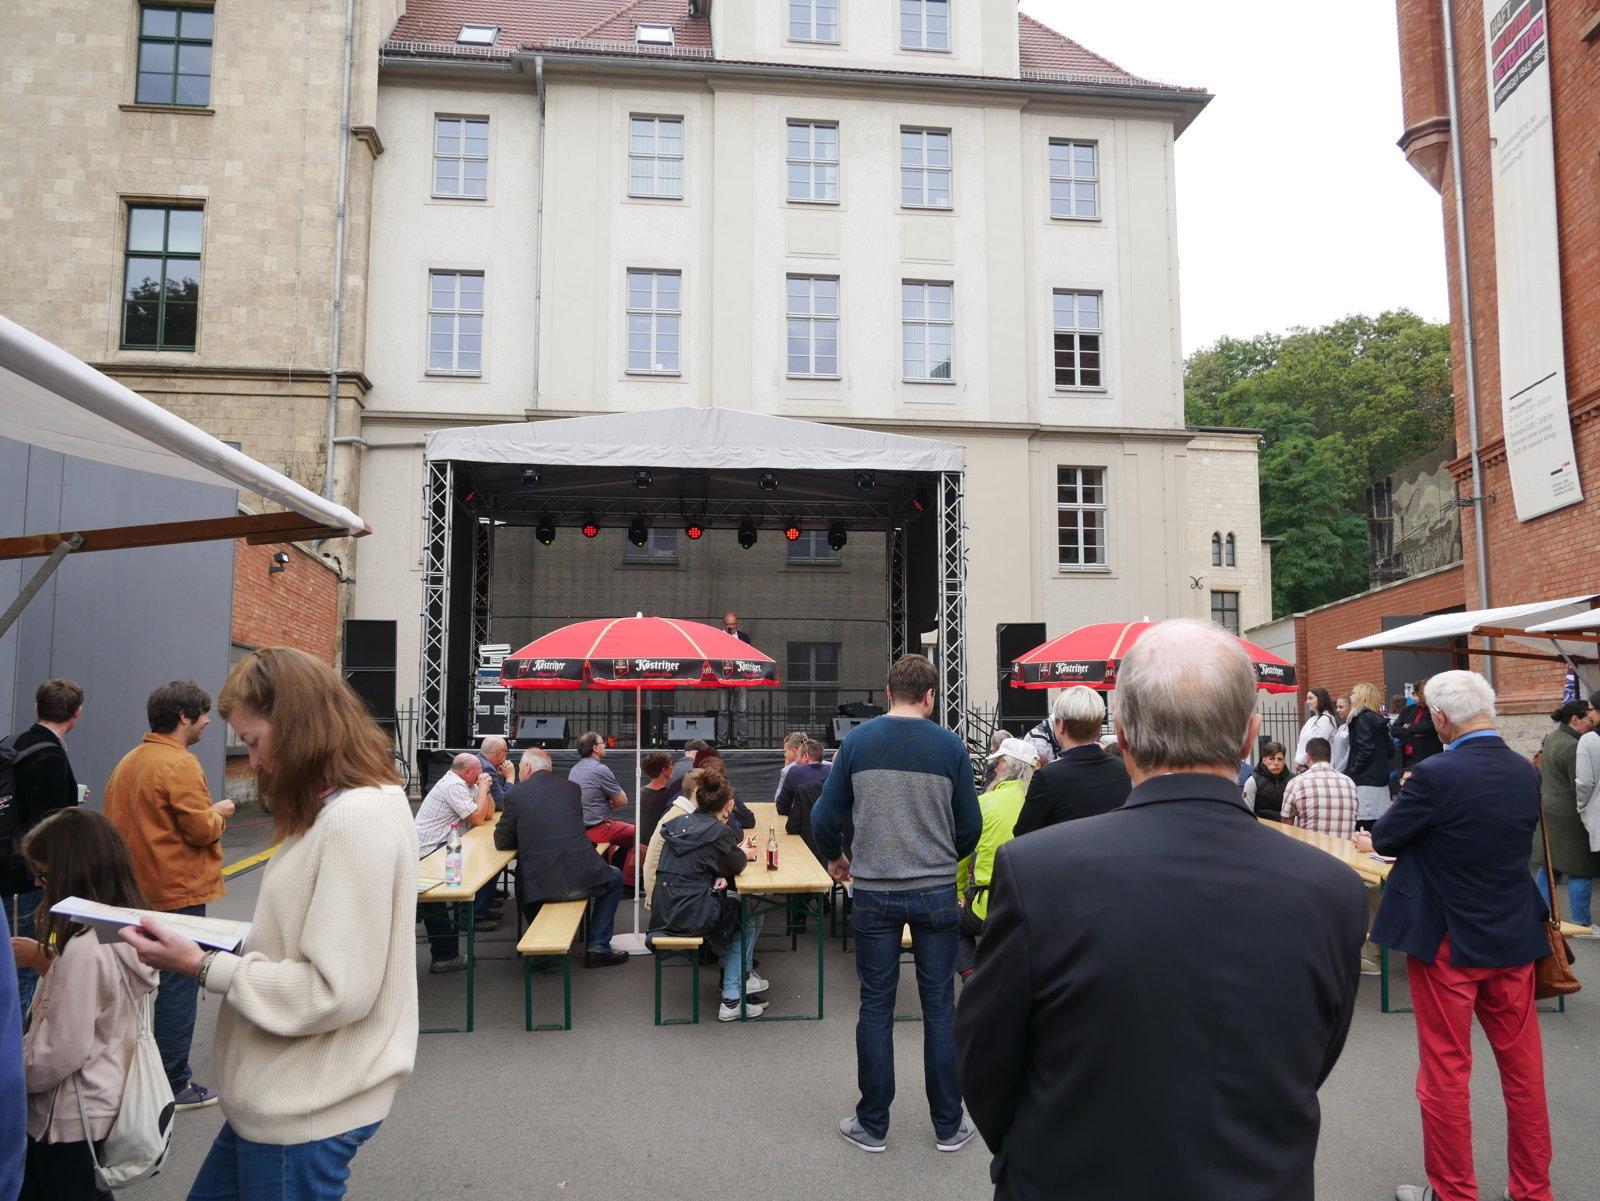 Bürgerfest - Buergerfest Förderverein Gedenkstätte Andreasstraße